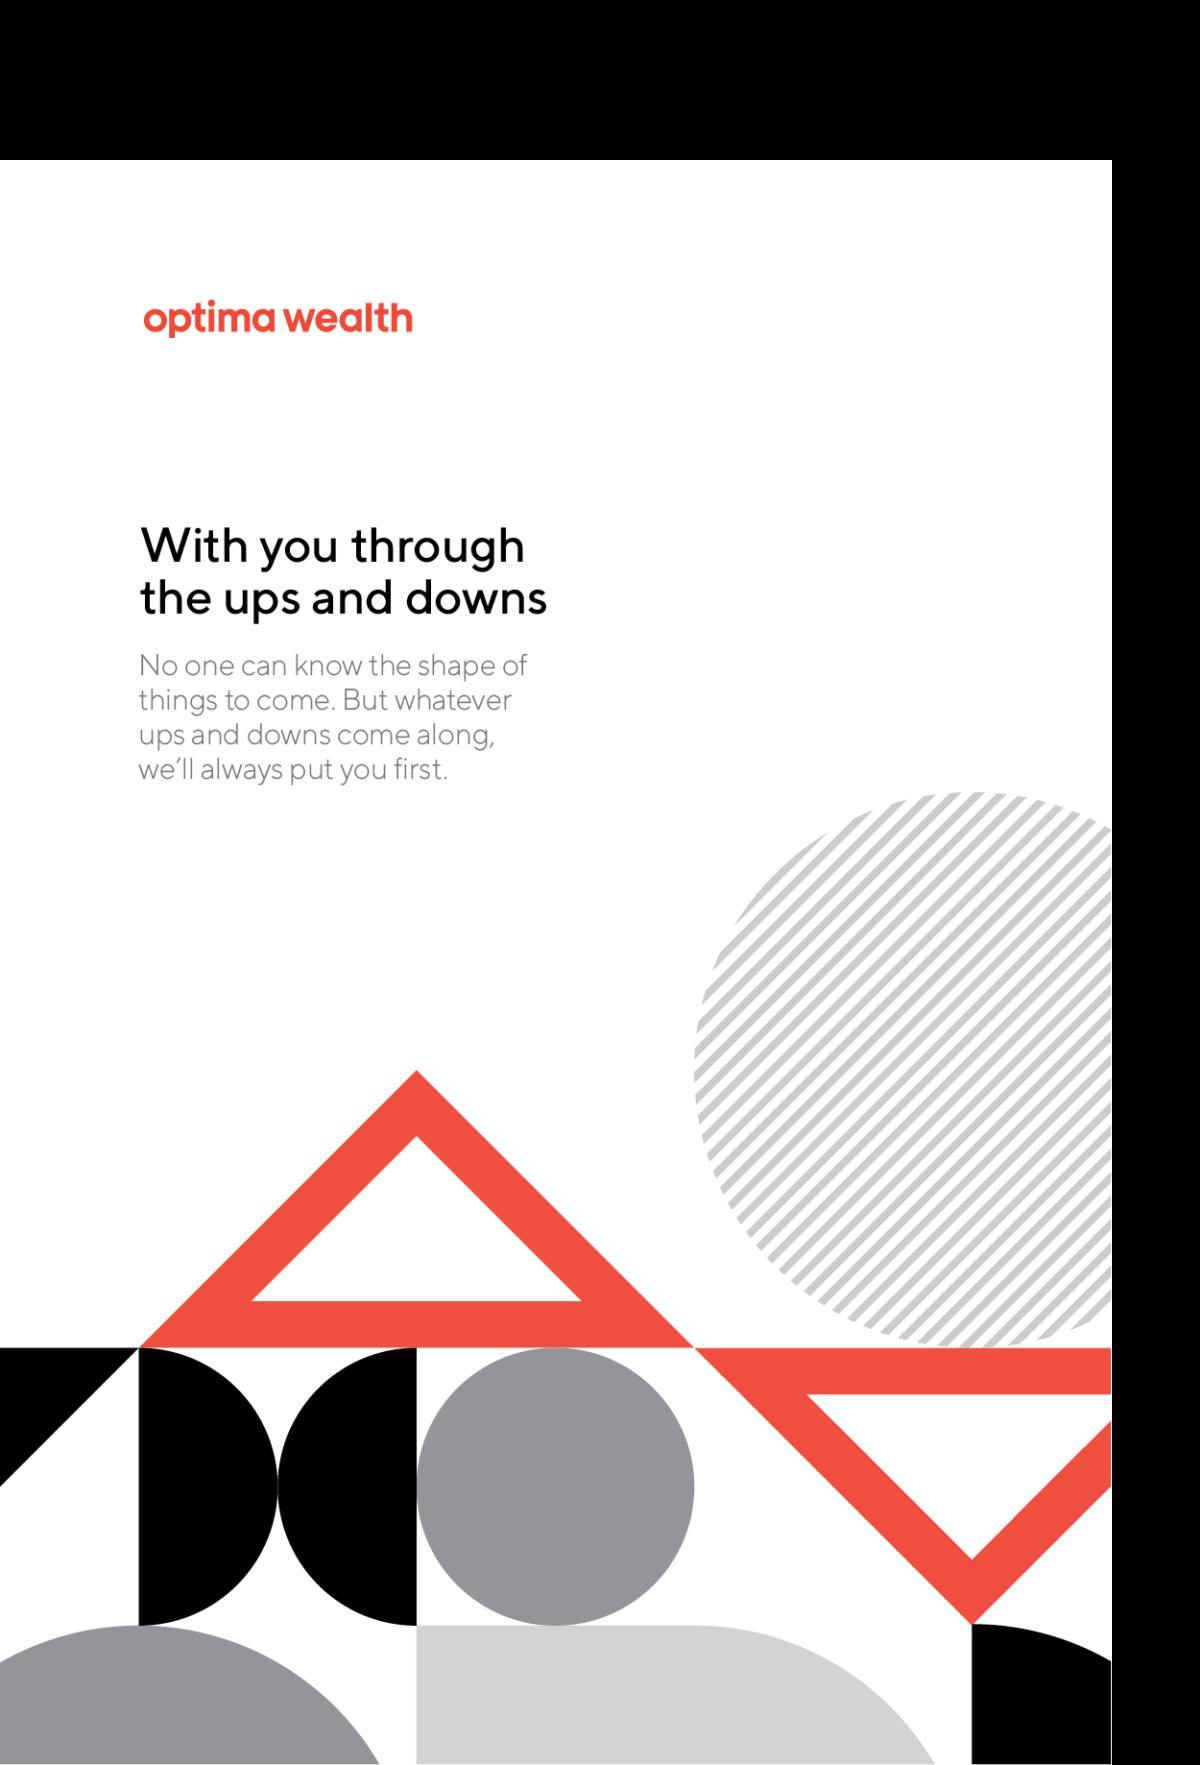 Optima Wealth Brand Images 2020 5